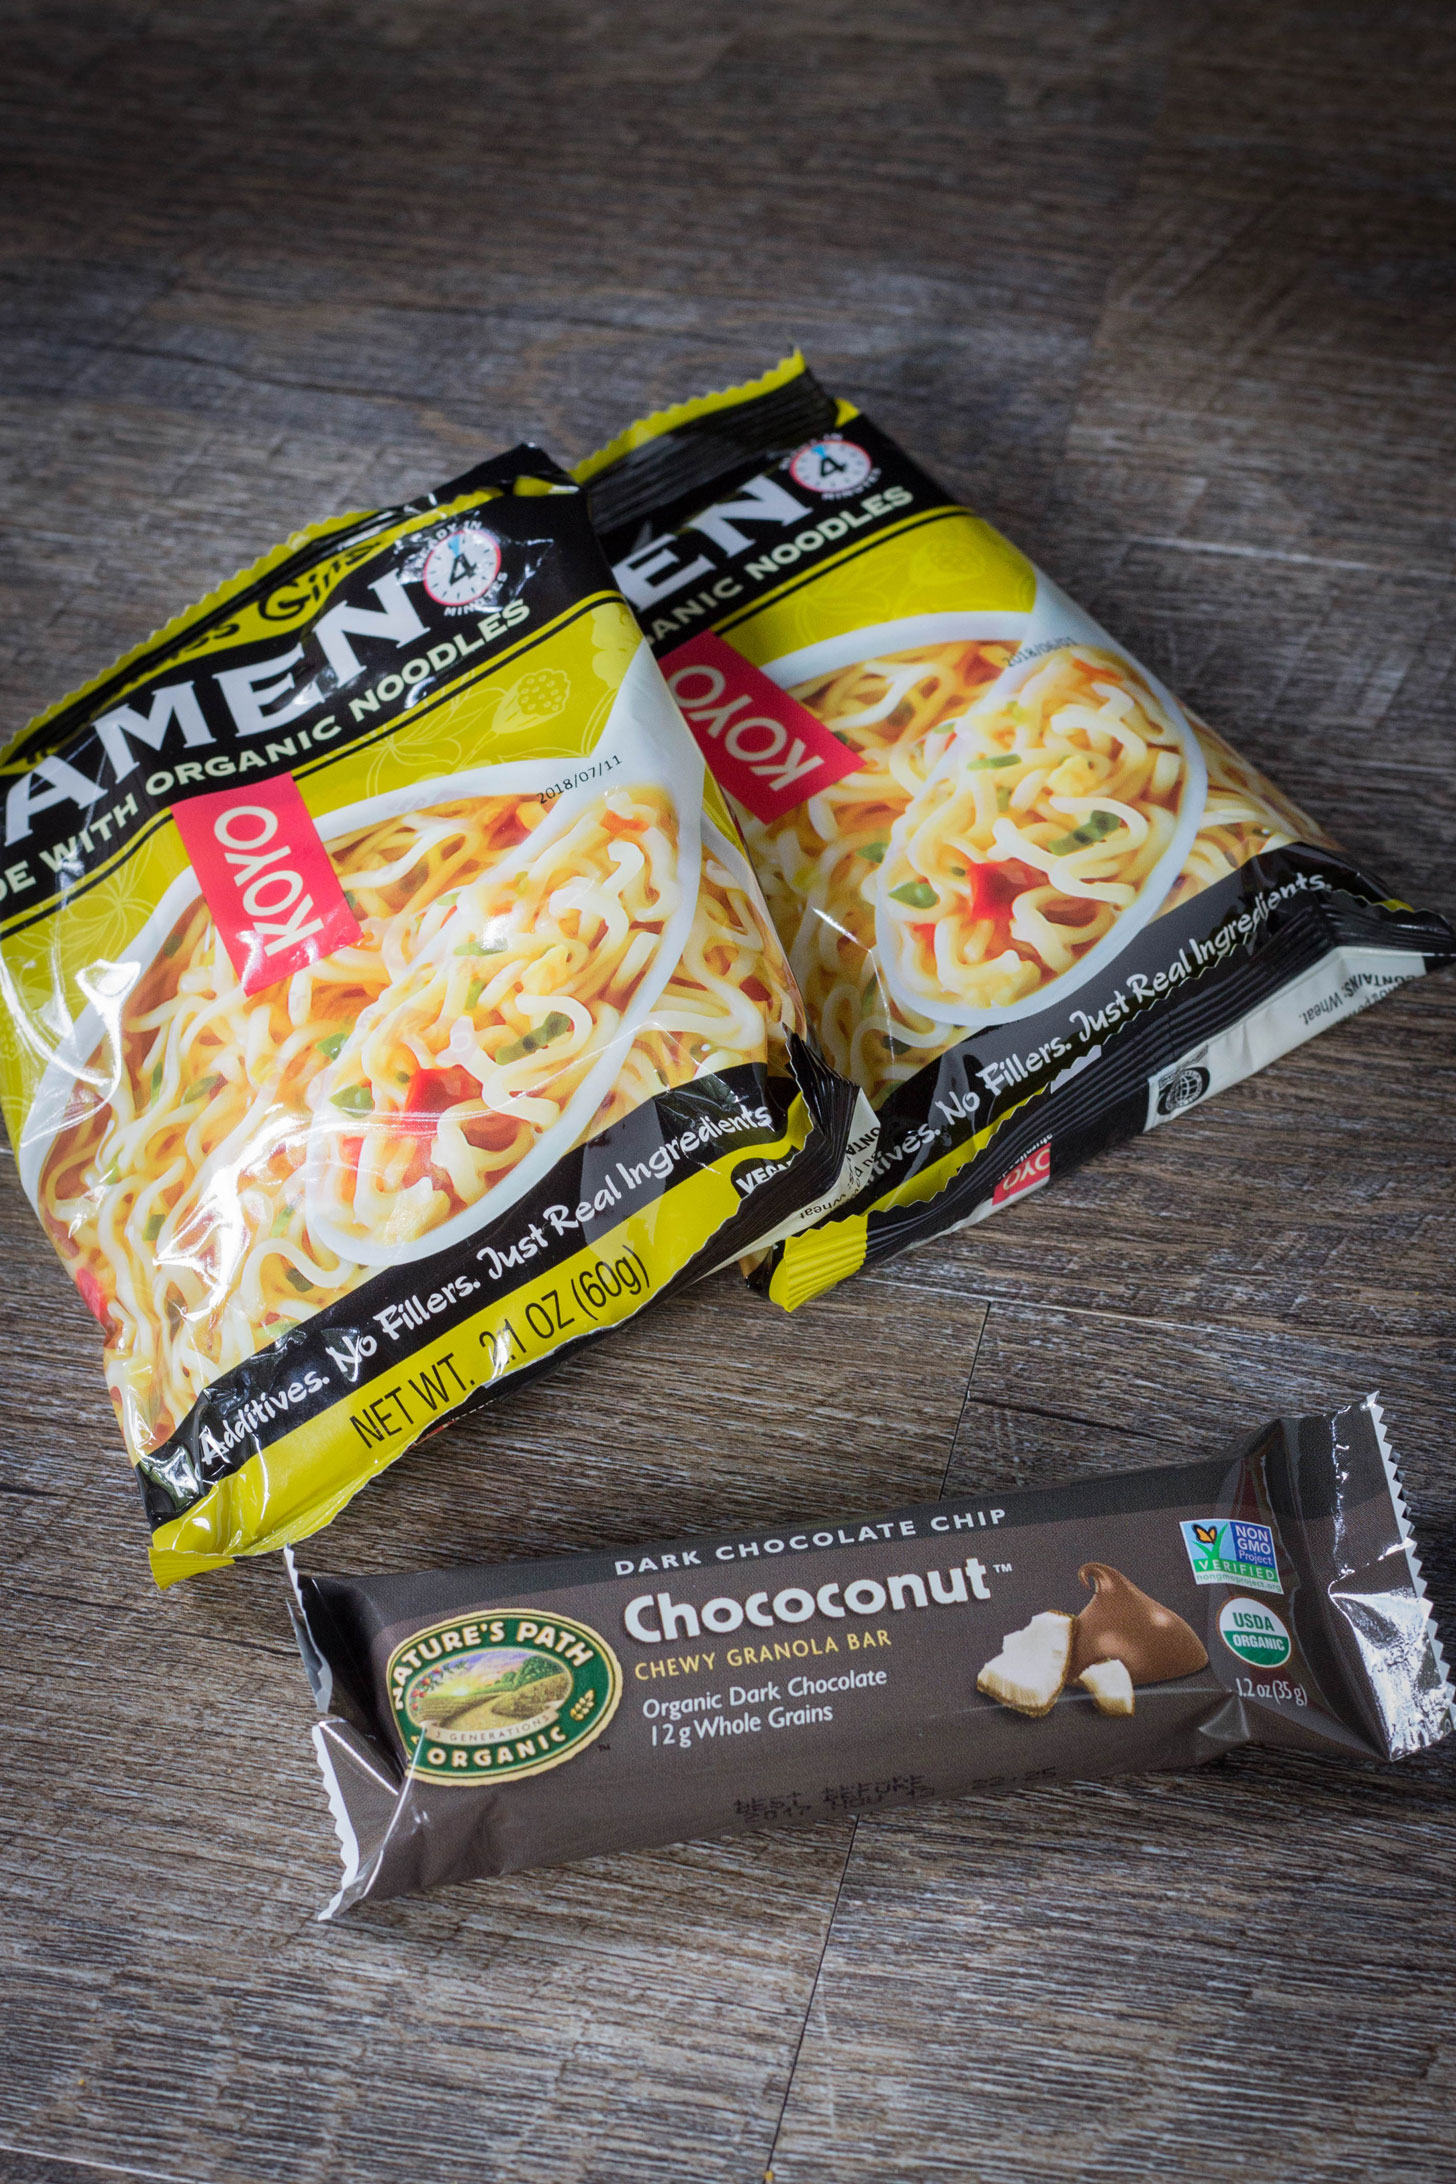 Koyo ramen and a Nature's path granola bar.